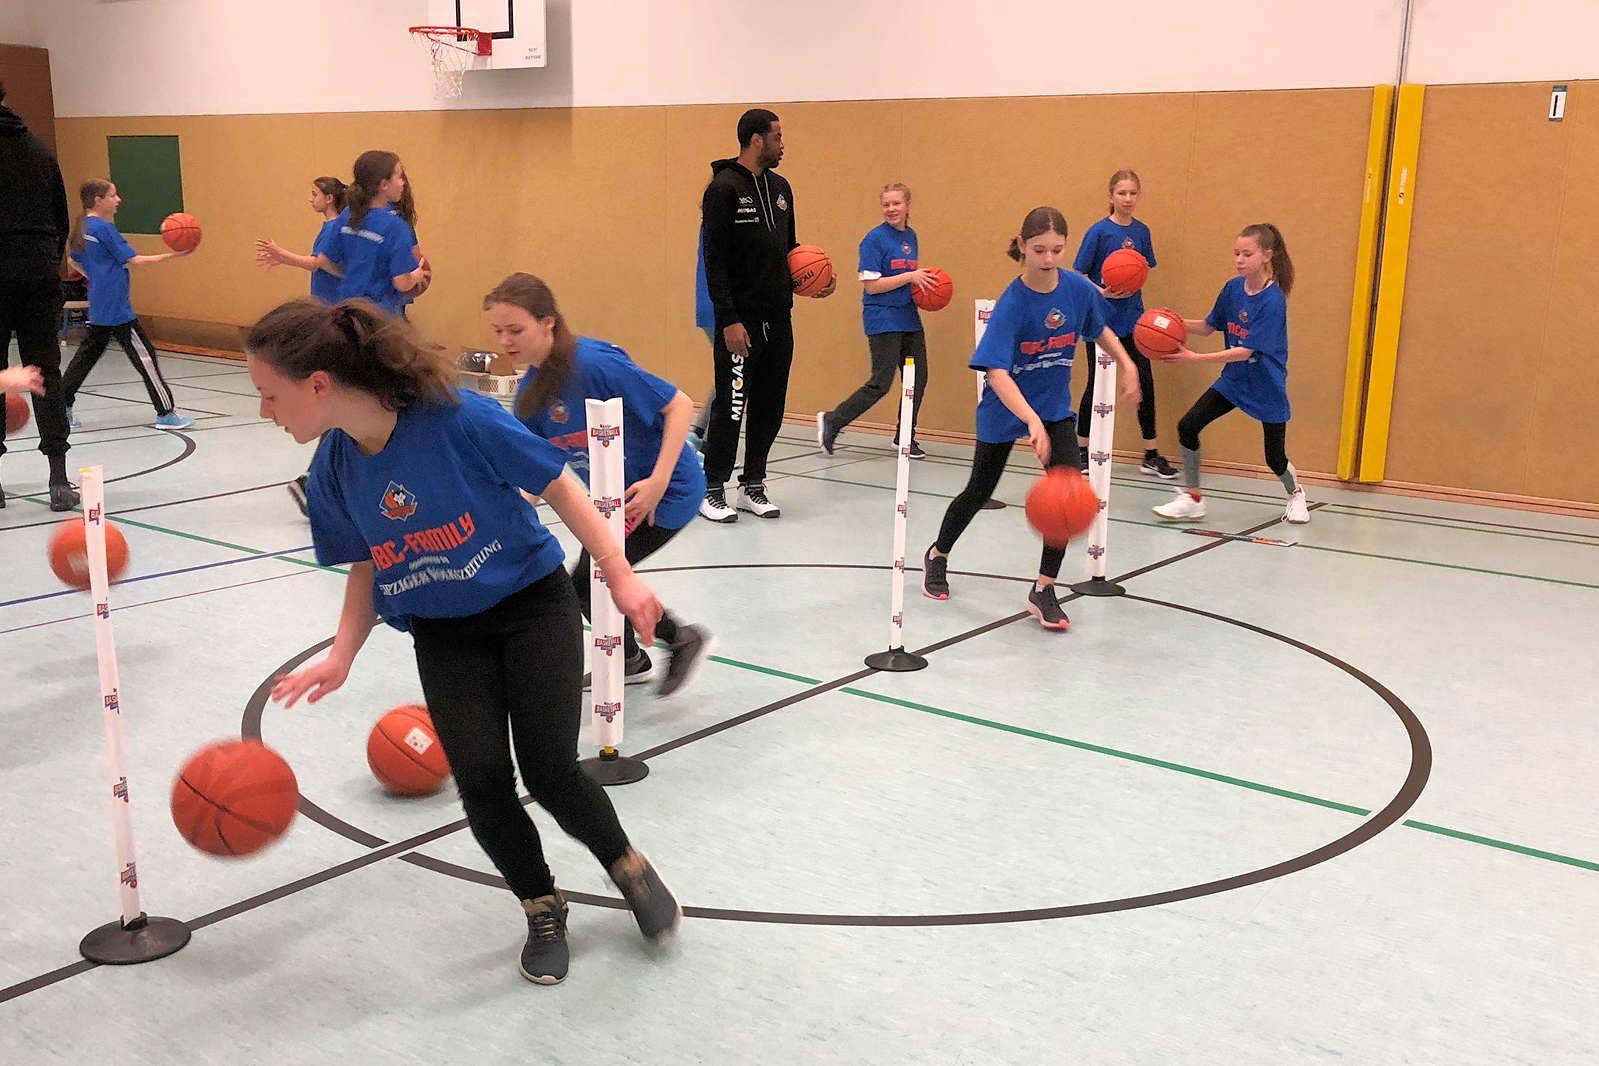 new product 64d9e 84b6f kinder+Sport Basketball Academy lockt nach Leipzig - MBC